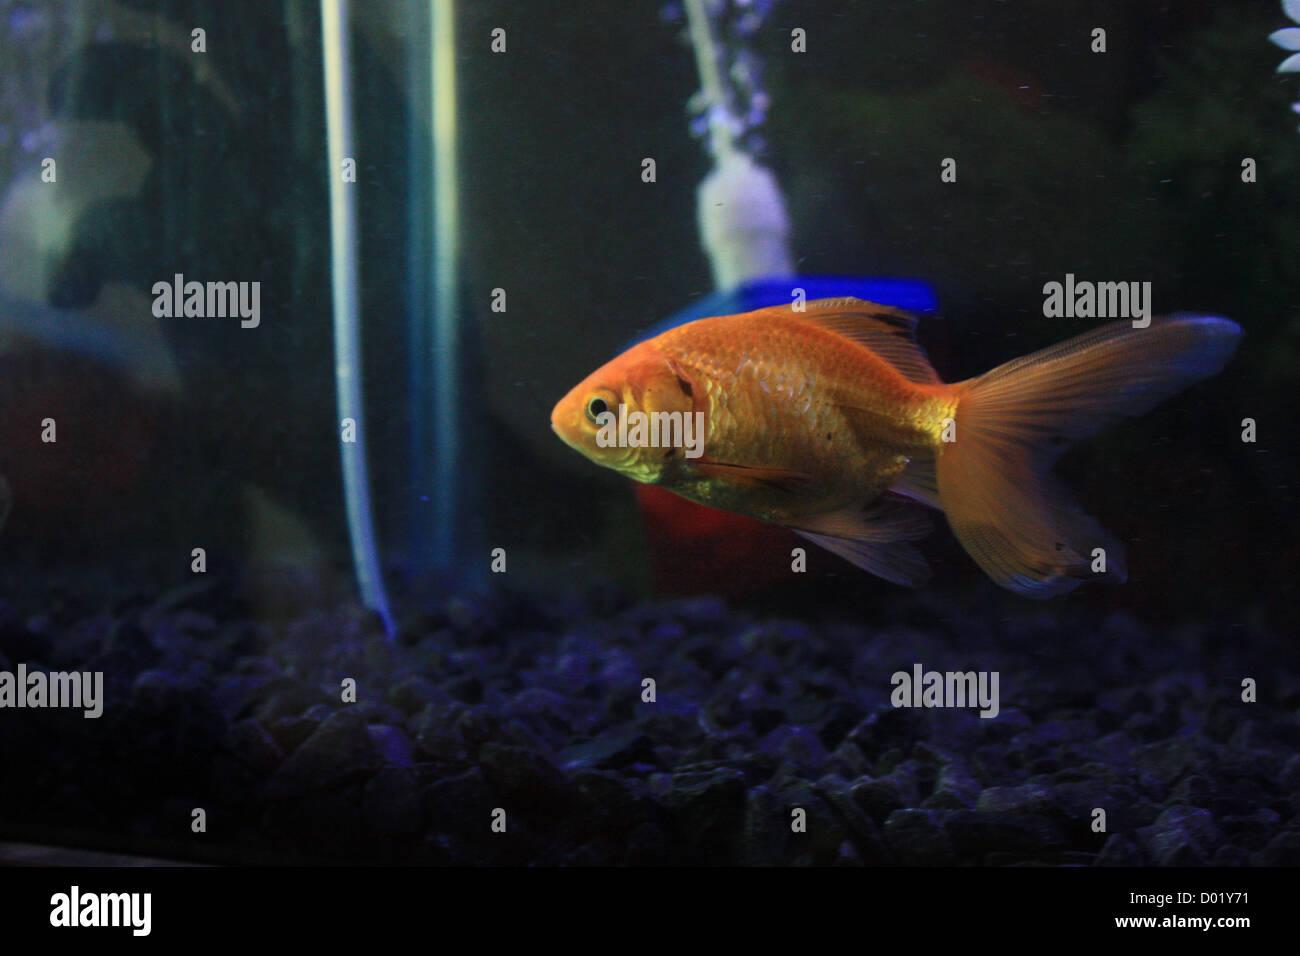 Freshwater Fish Aquarium Fish Tropical Fish Pictures Of Fish